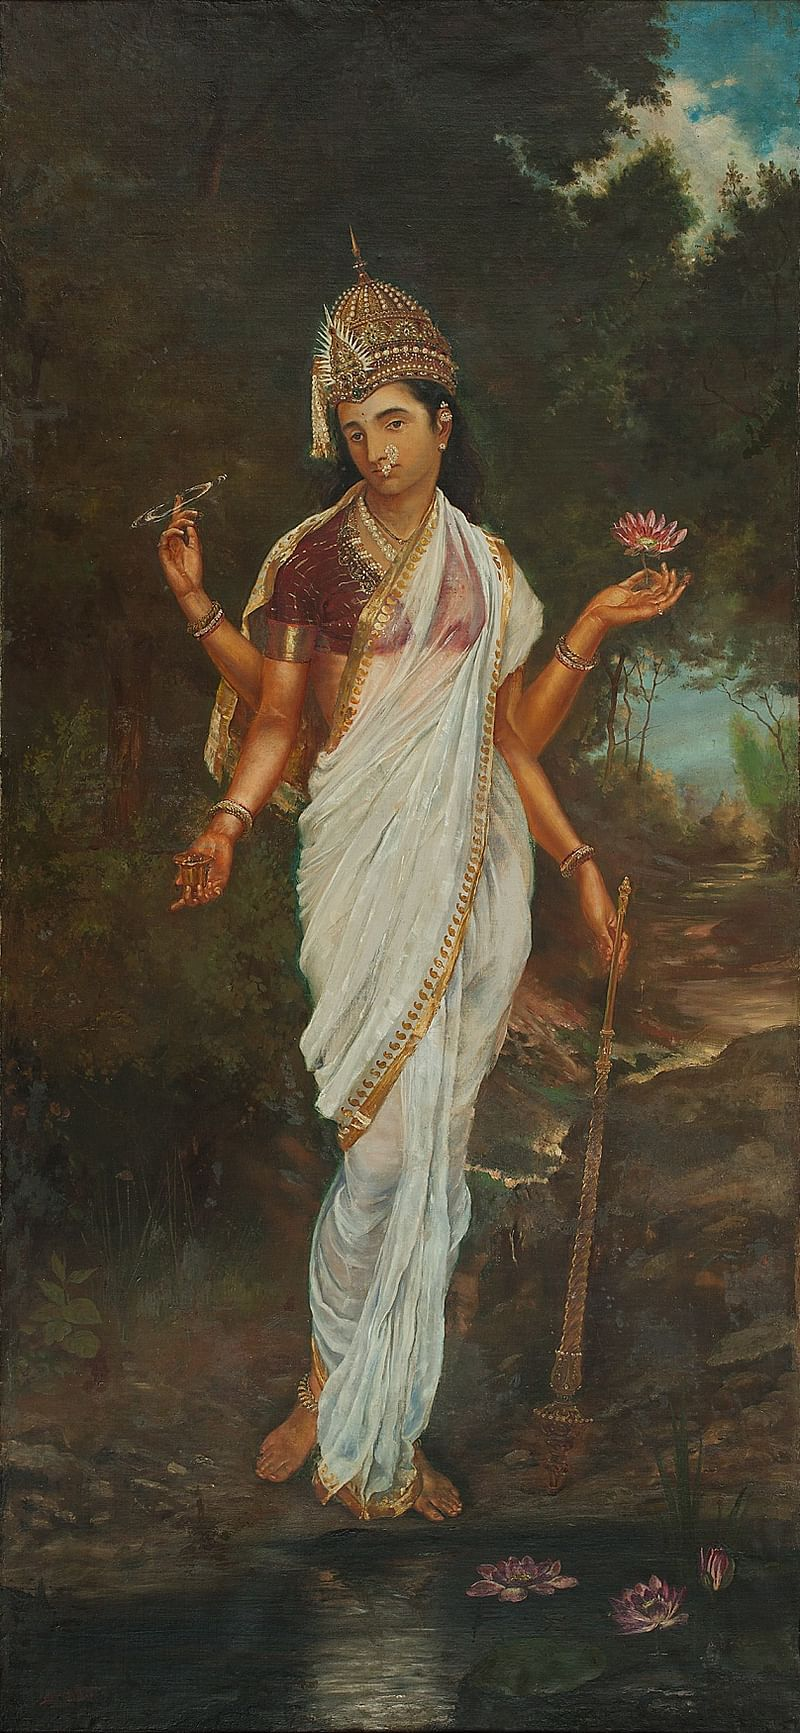 Untitled (Lakshmi) by M. V. Dhurandhar